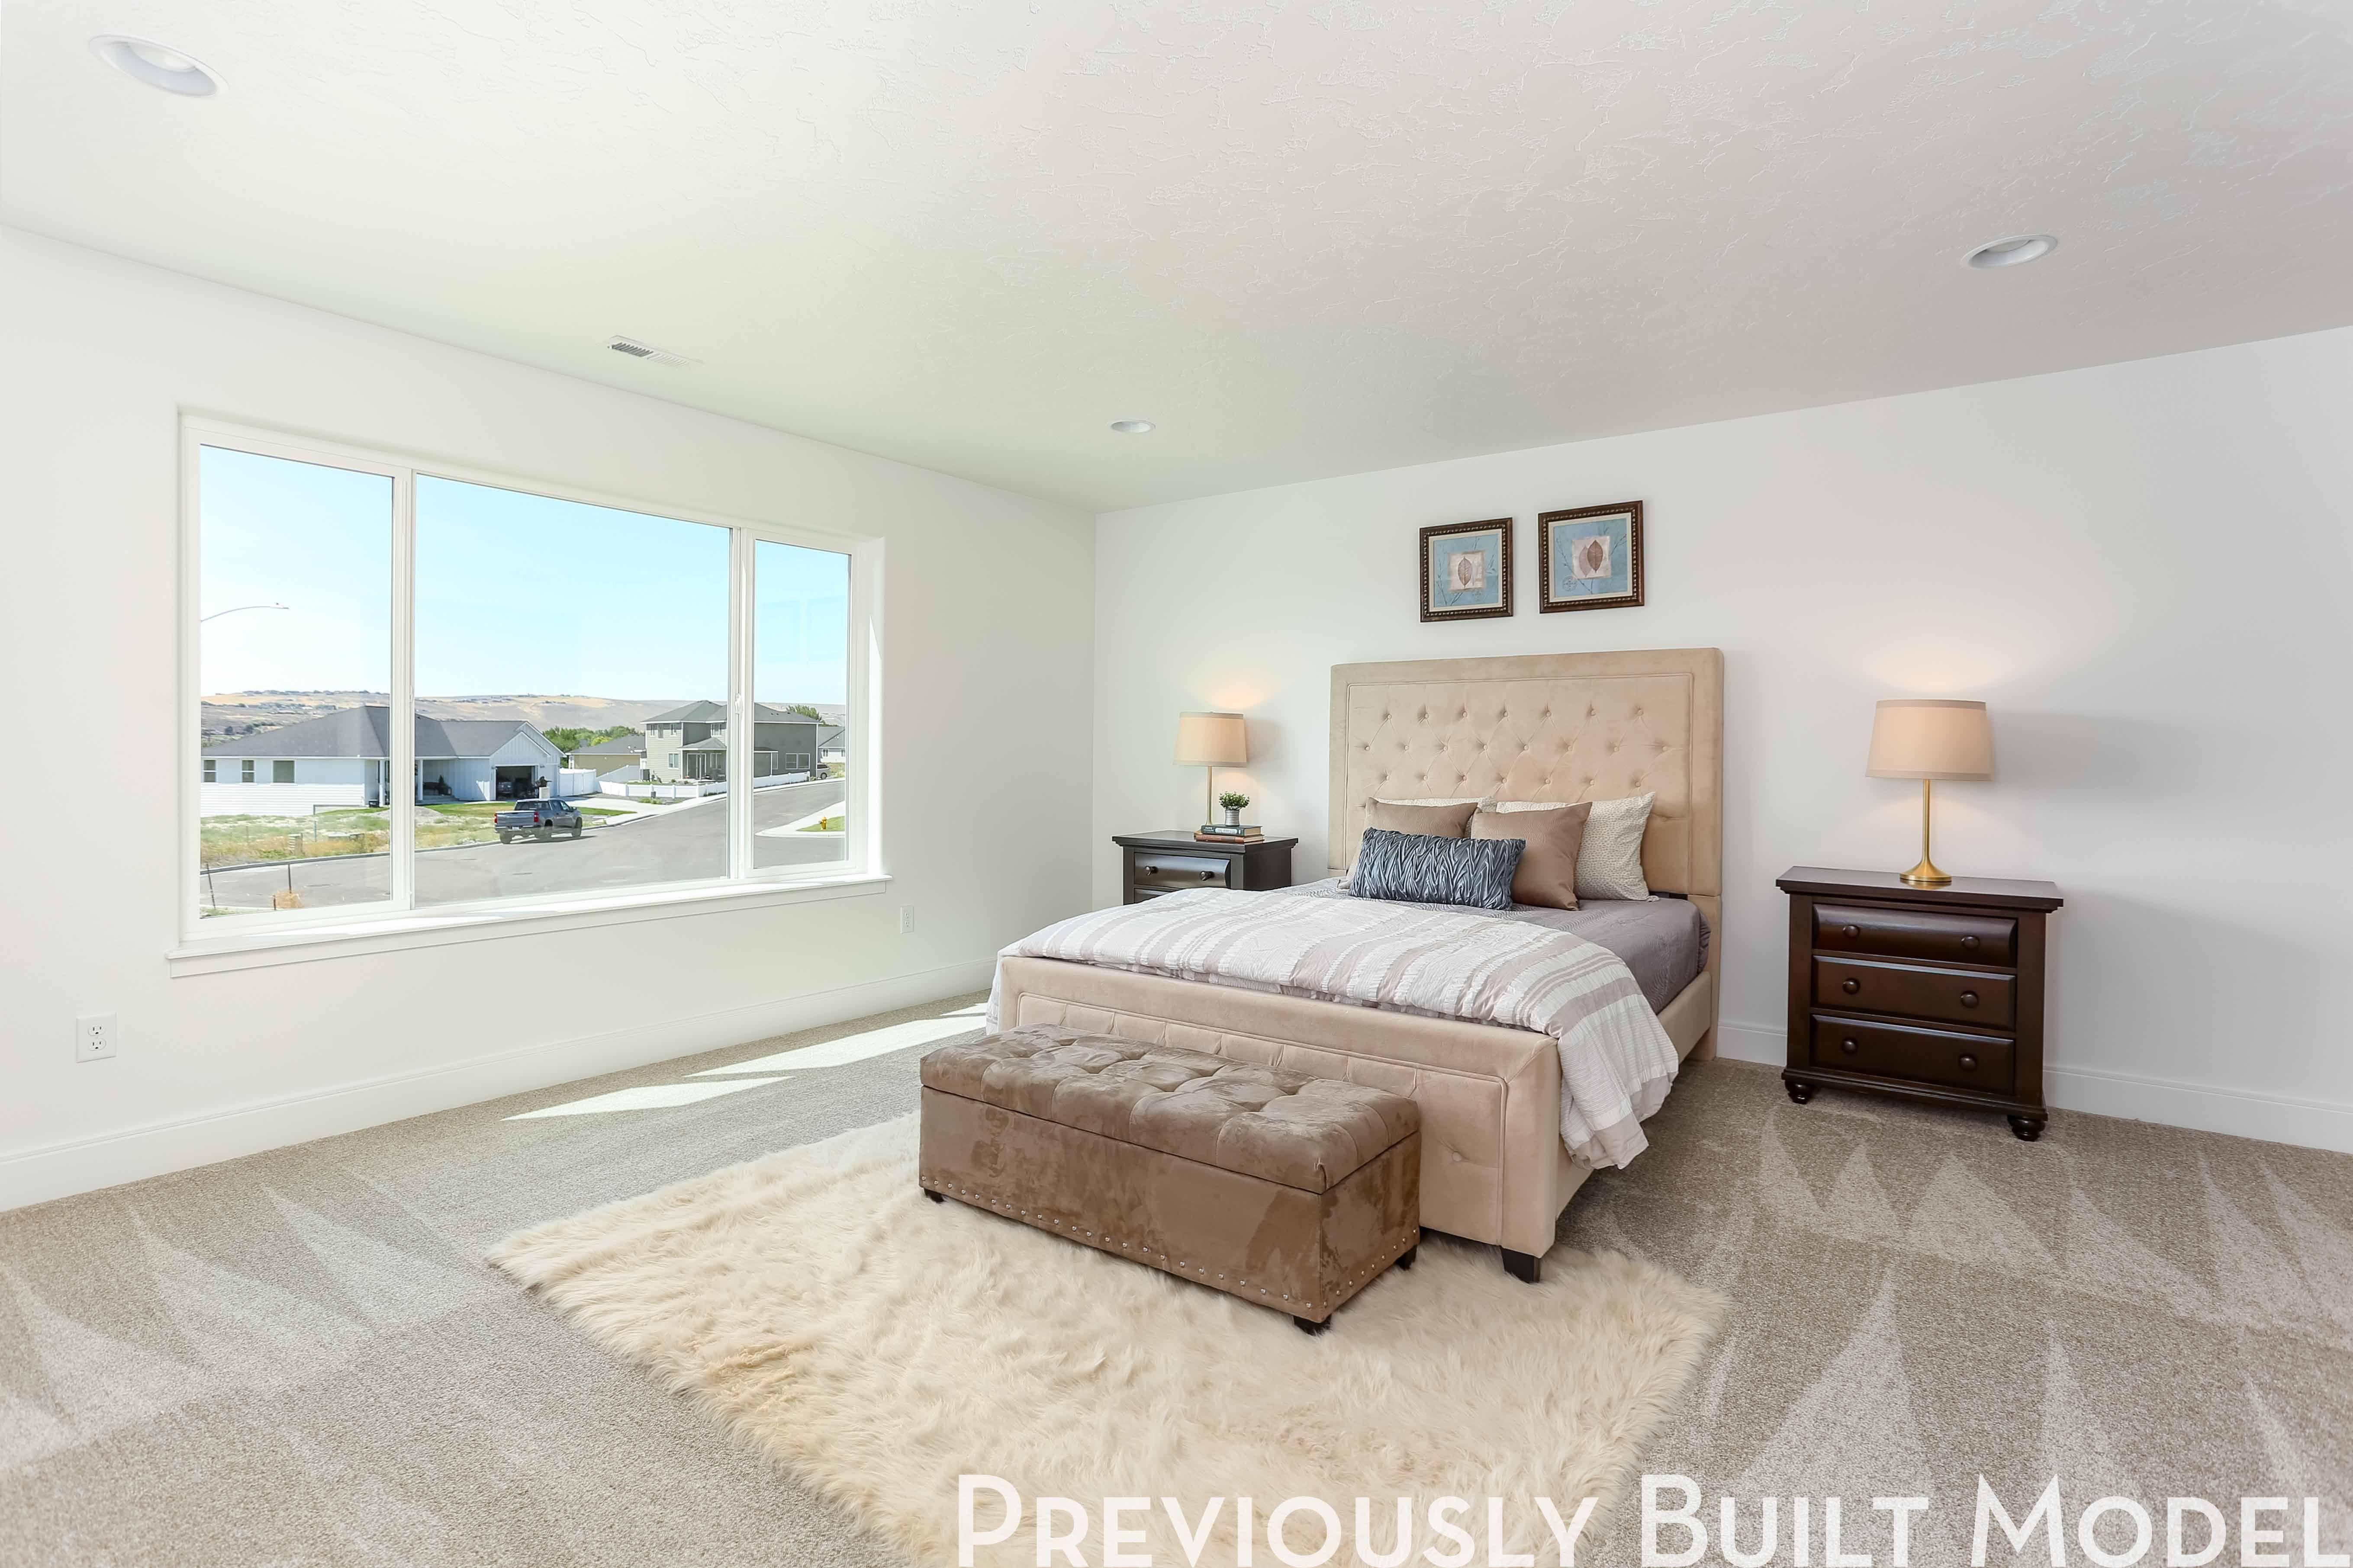 Bedroom featured in The Savannah By RYN Built Homes in Spokane-Couer d Alene, WA